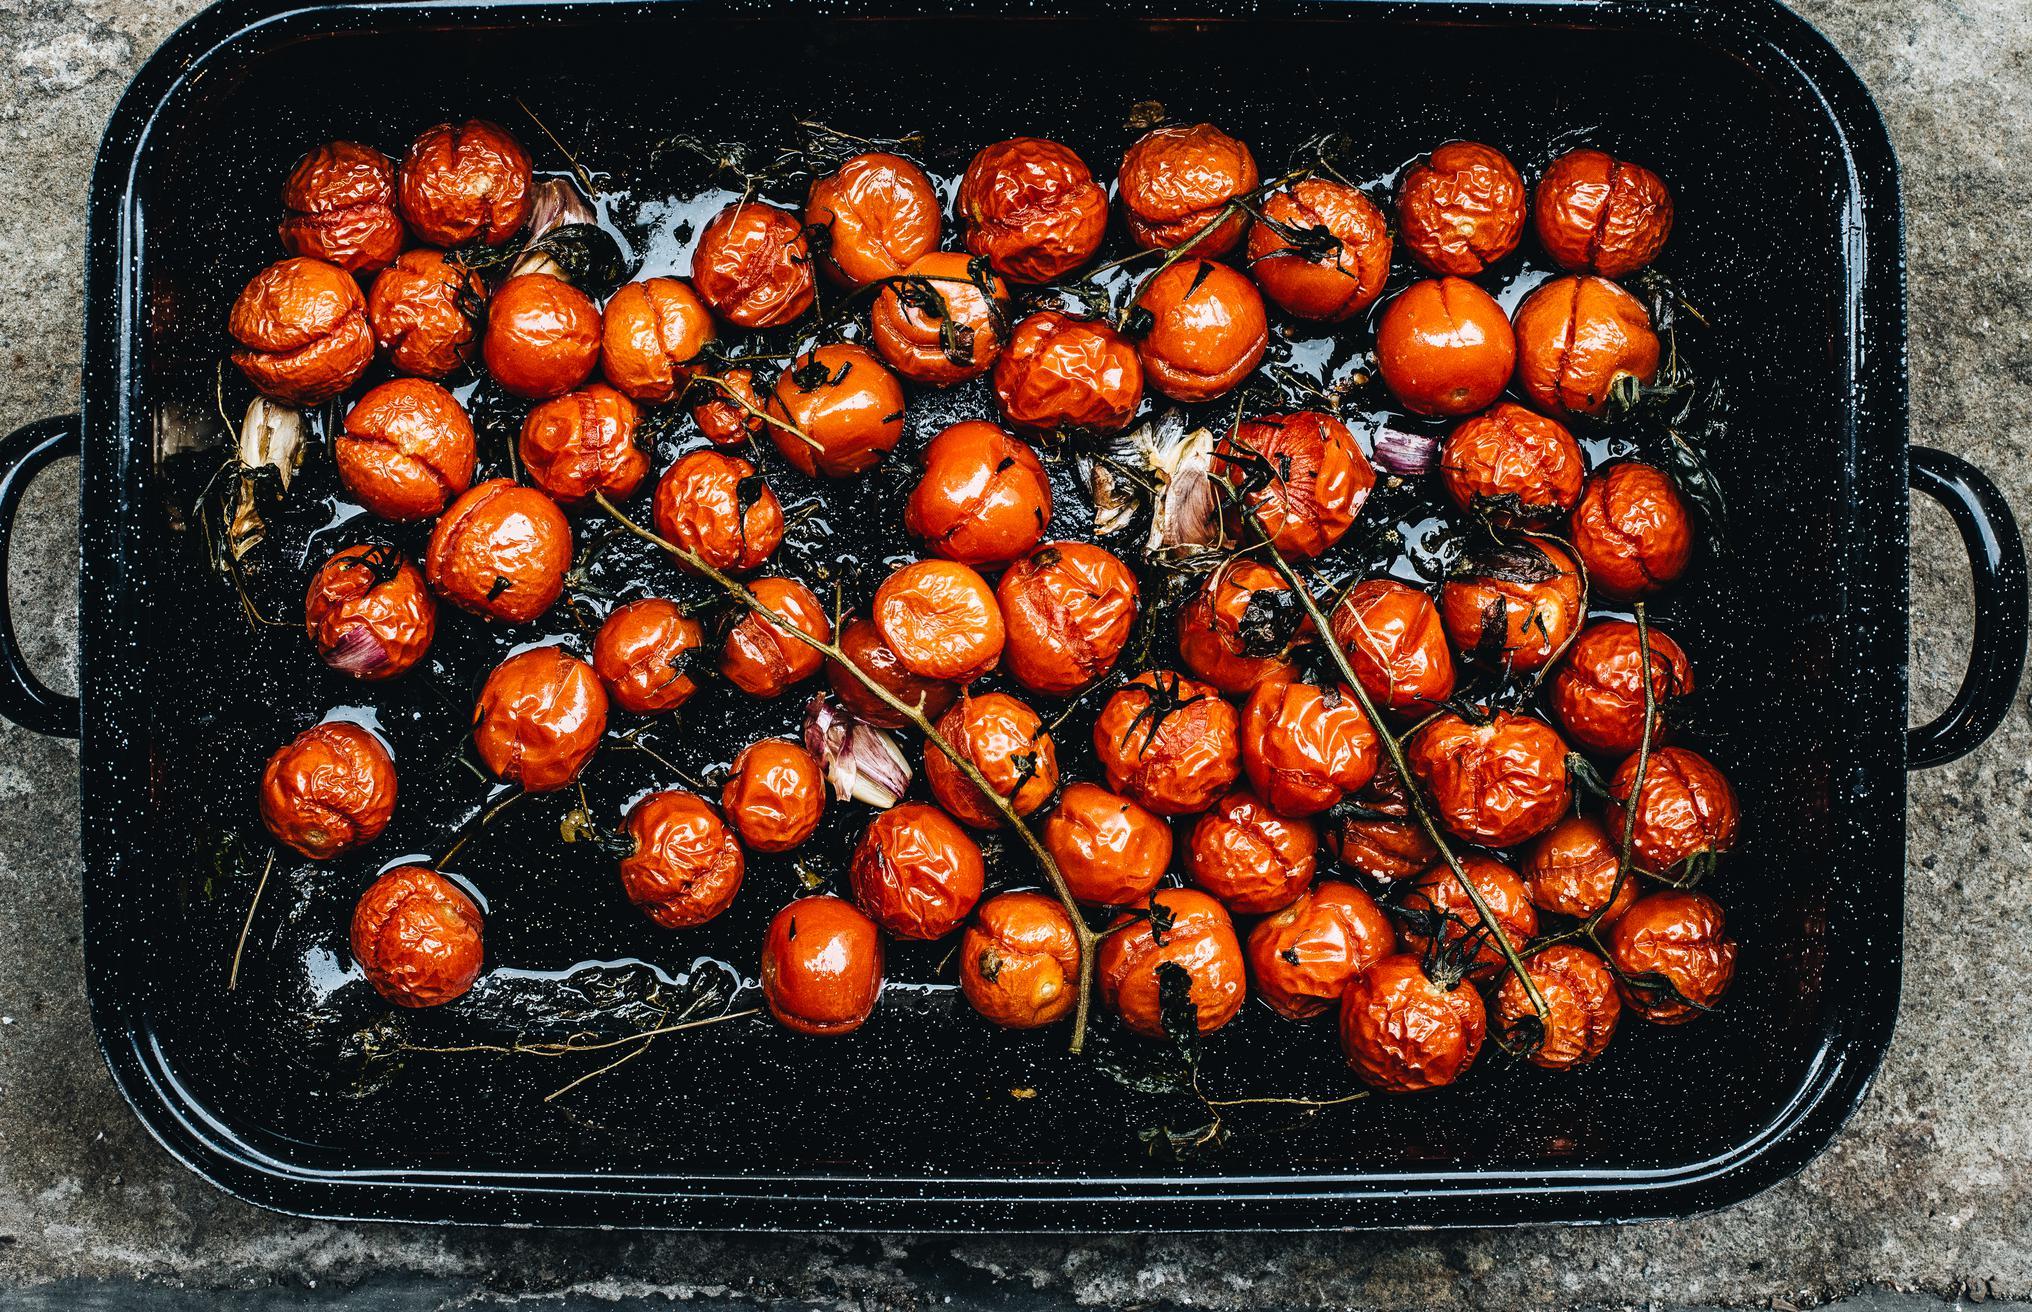 Im Ofen gebackene Tomaten mit Kräutern